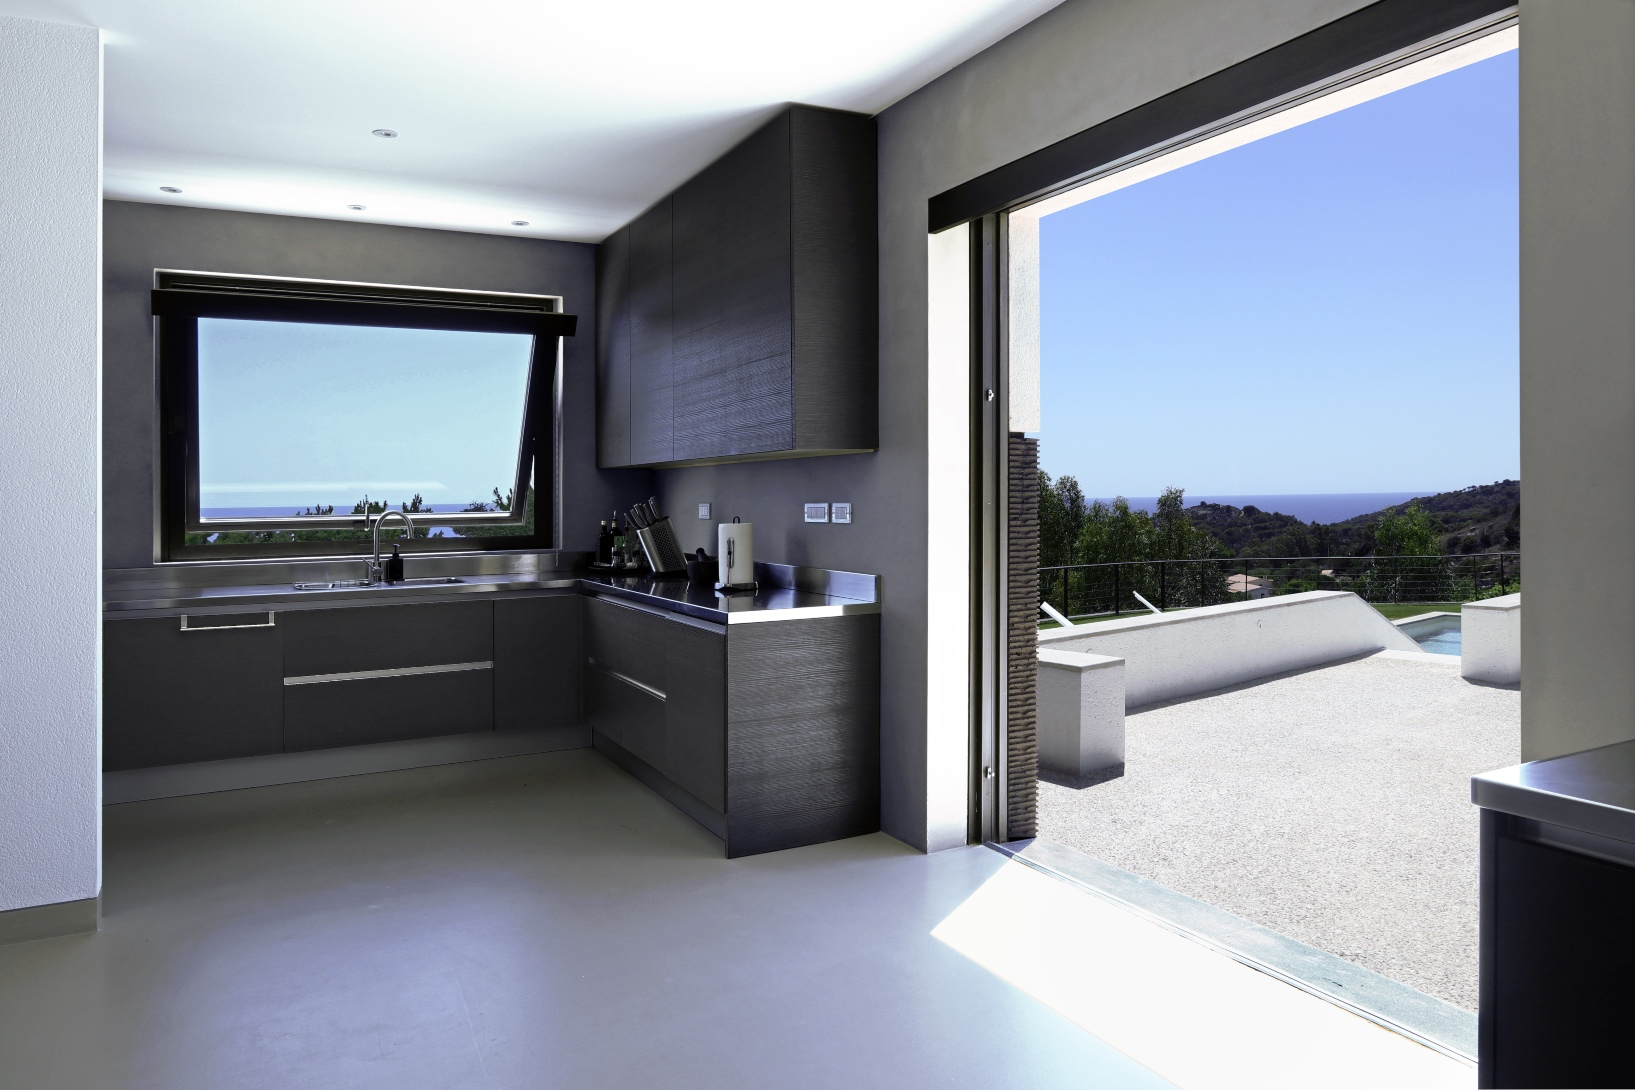 16_House-along-Sardinias-Coastline_Pierluigi-Piu_Inspirationist